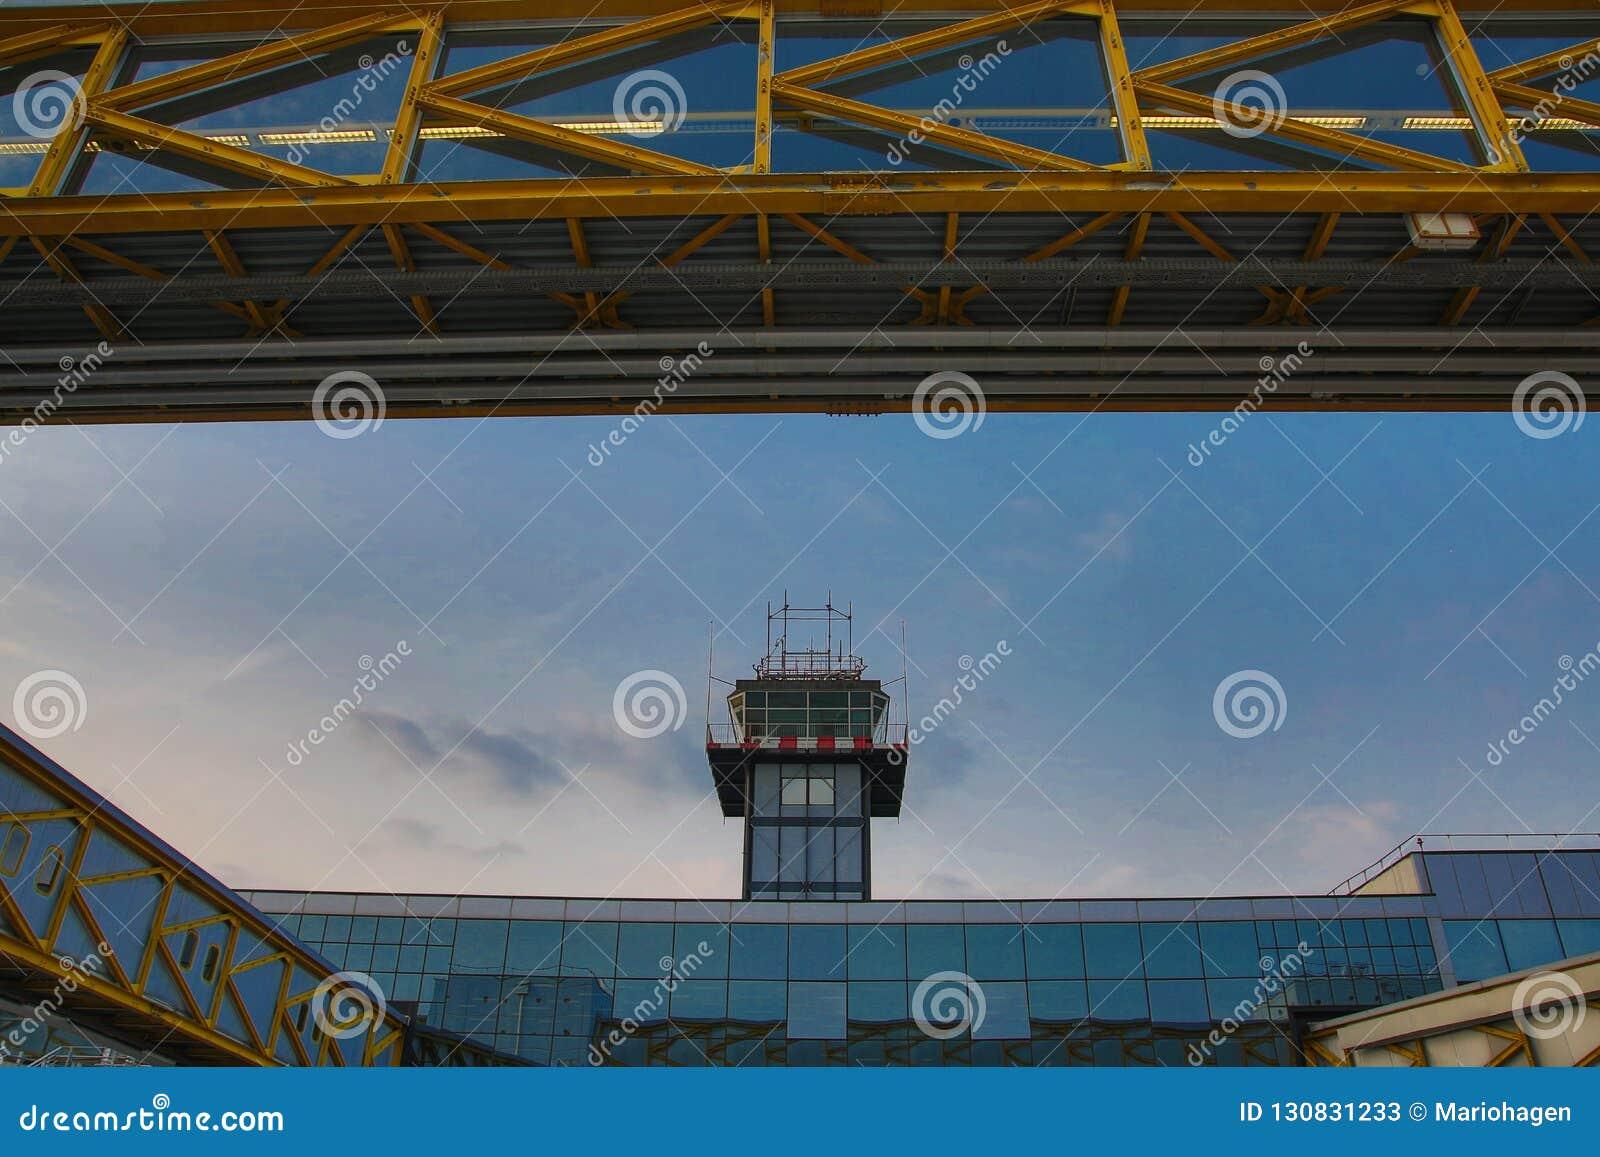 Milan Malpensa International Airport, Italy - Main ...